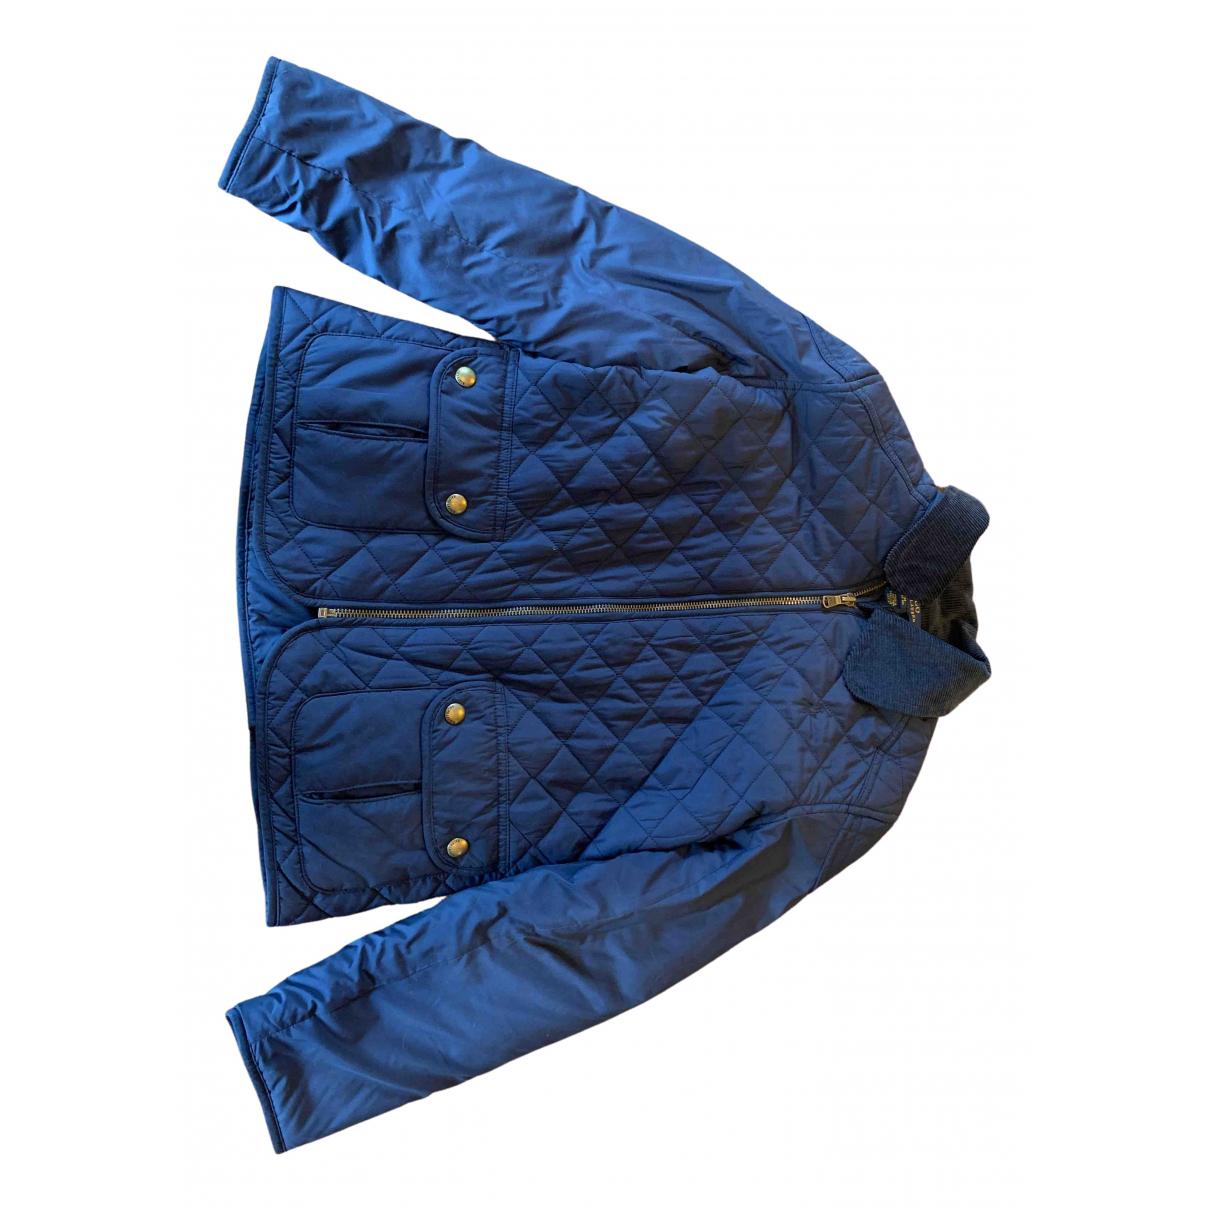 Polo Ralph Lauren \N Jacke, Maentel in  Marine Polyester